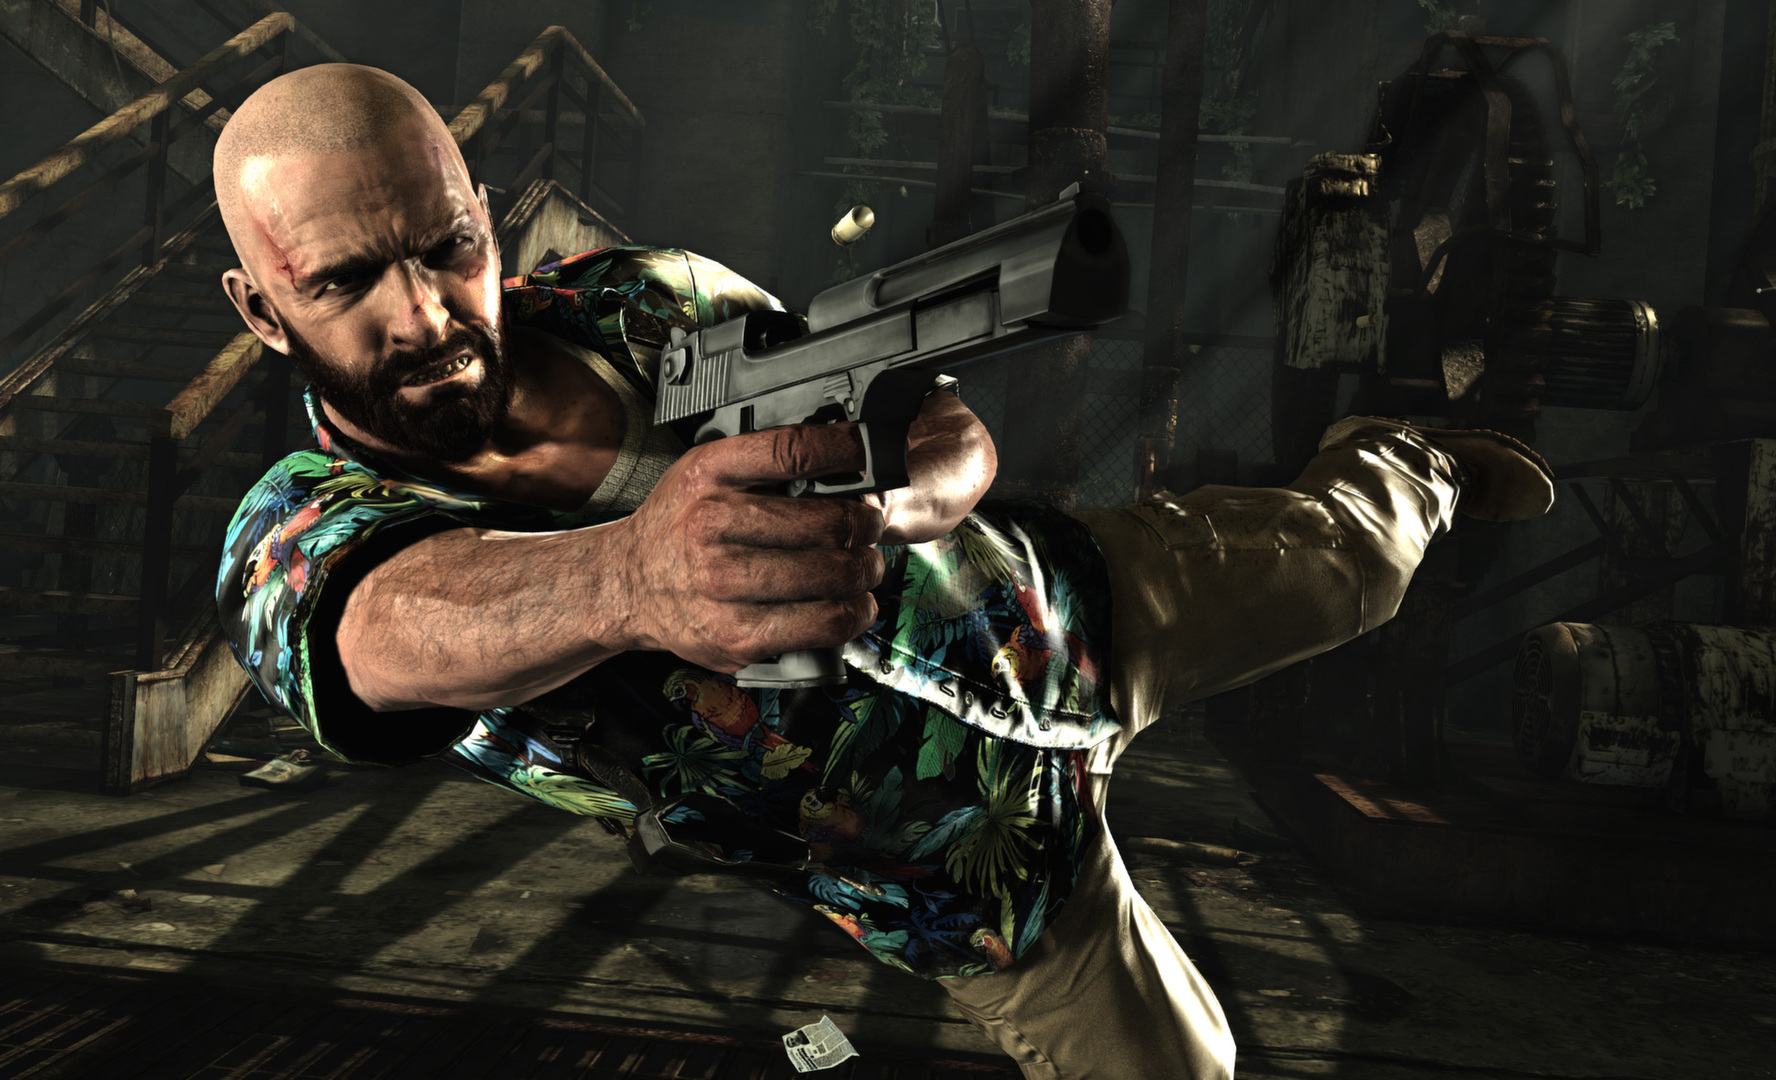 Max Payne 3 On Steam